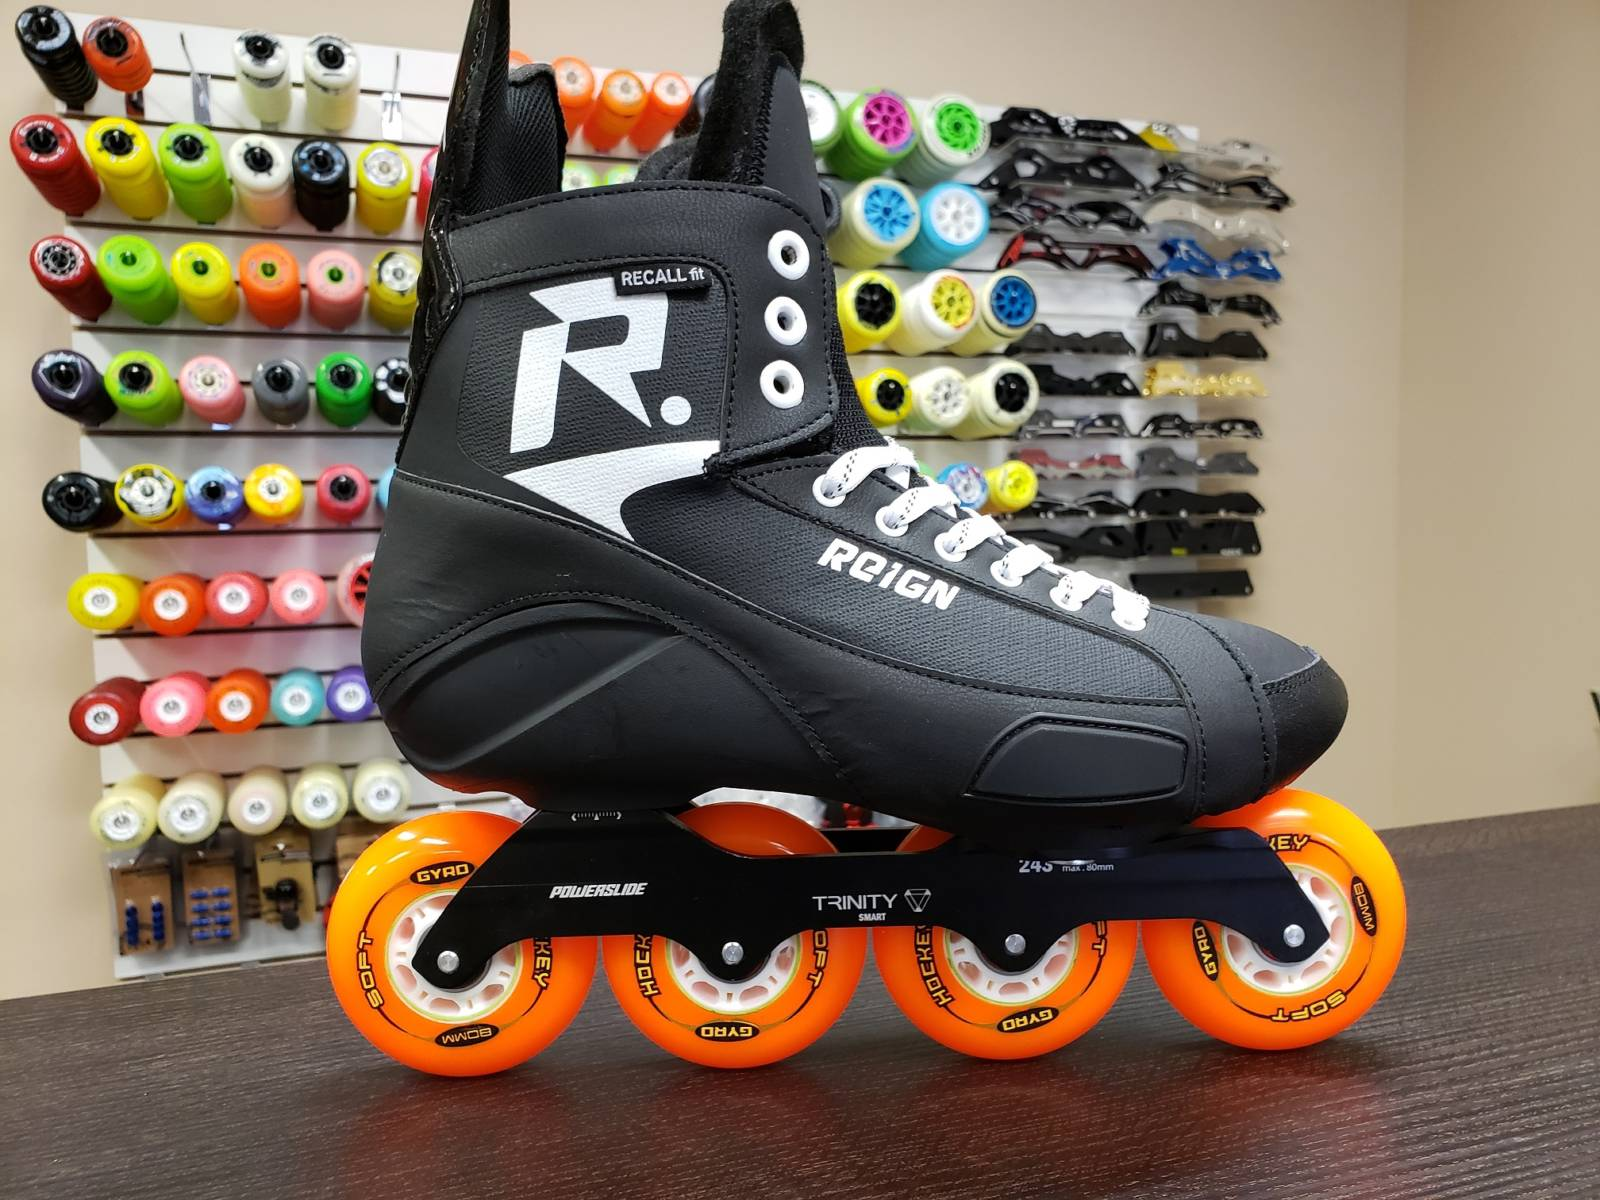 Reign Roller Hockey Apollo Trinity Hi Lo Skates 4x80 3x100